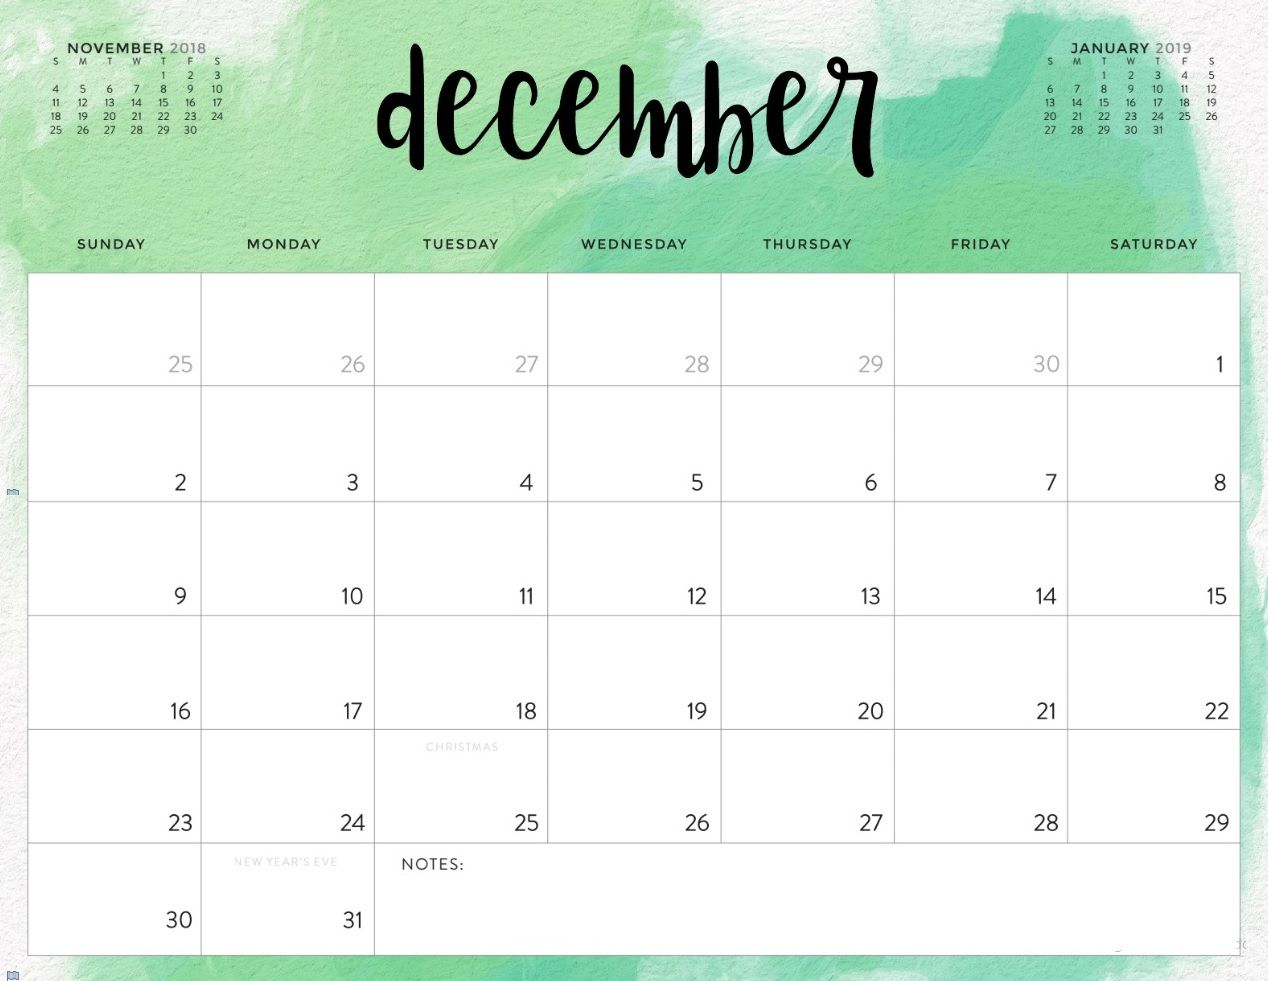 Free December 2018 Printable Calendar Blank Templates - Calendar for Blank Calendar For November And December